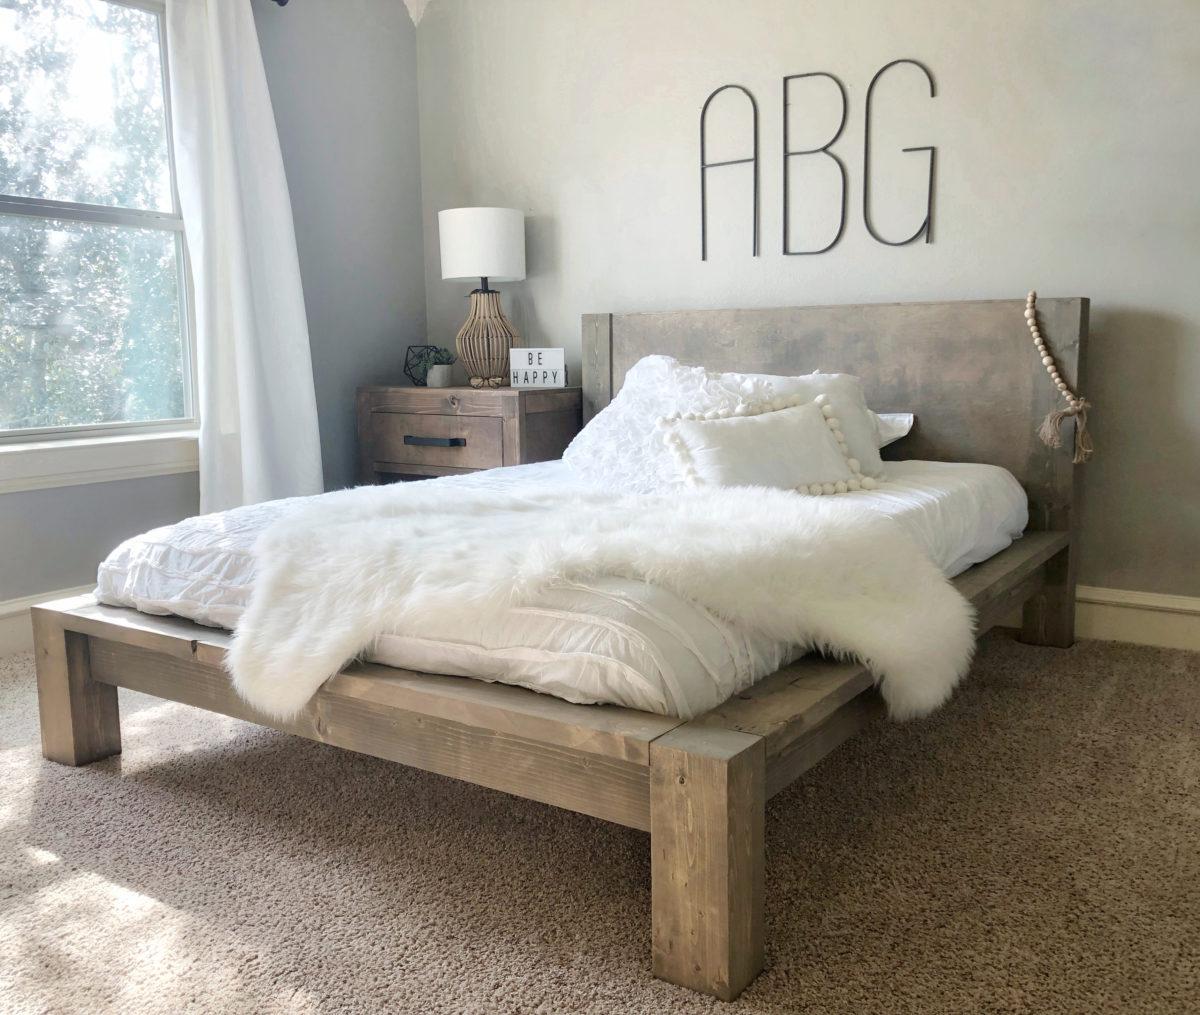 Diy Rustic Modern Queen Bed Shanty 2 Chic